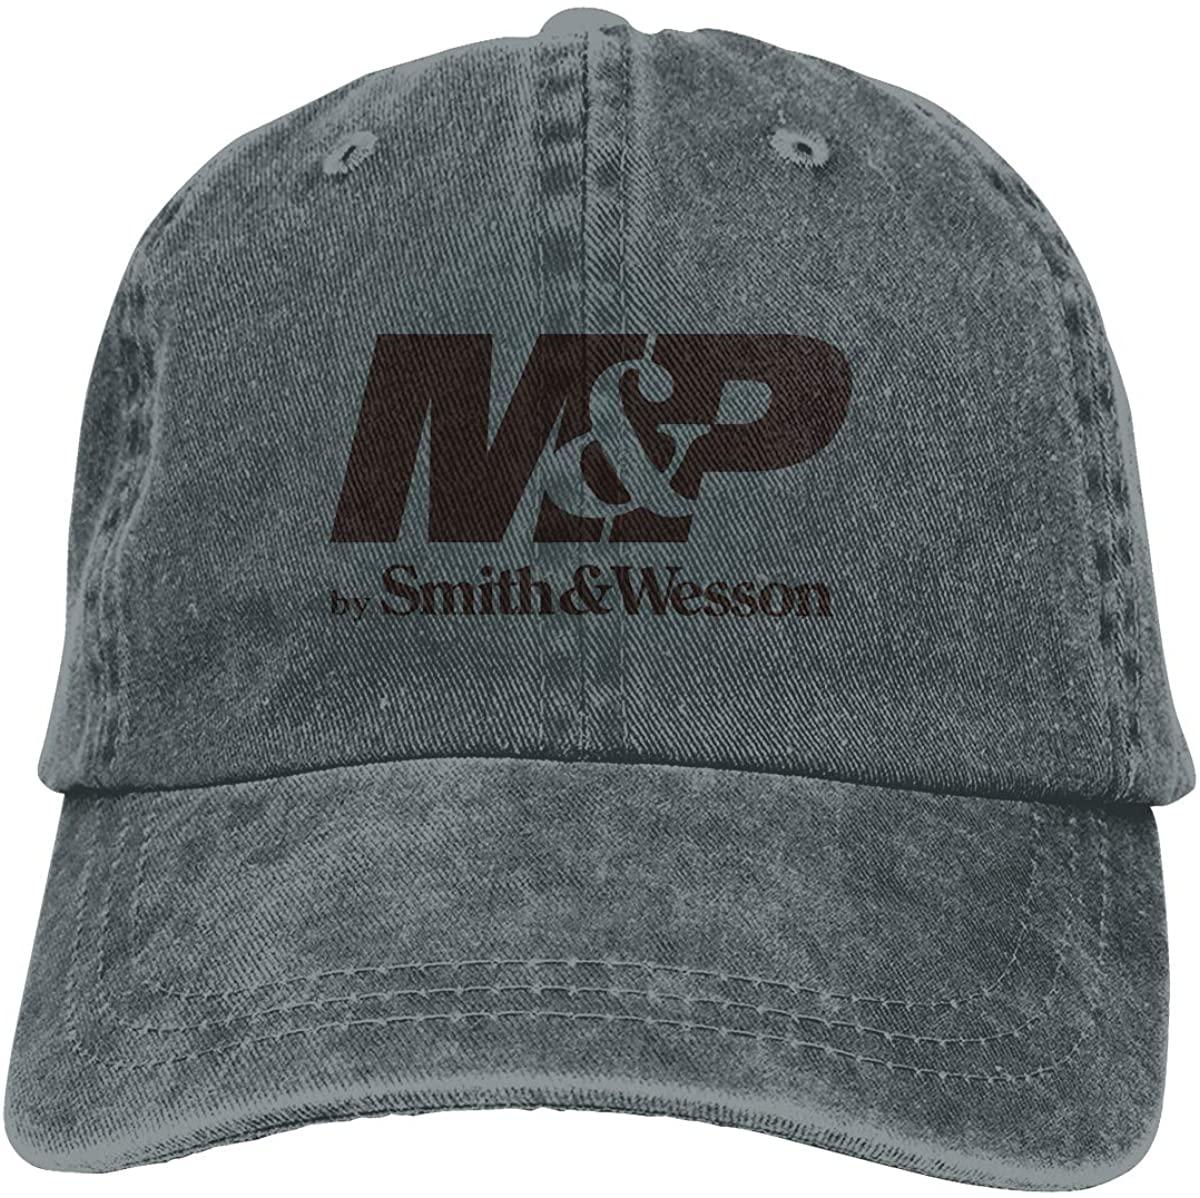 Smith & Wesson Cowboy Hat Outdoor Sports Hat Adjustable Cowboy Hat